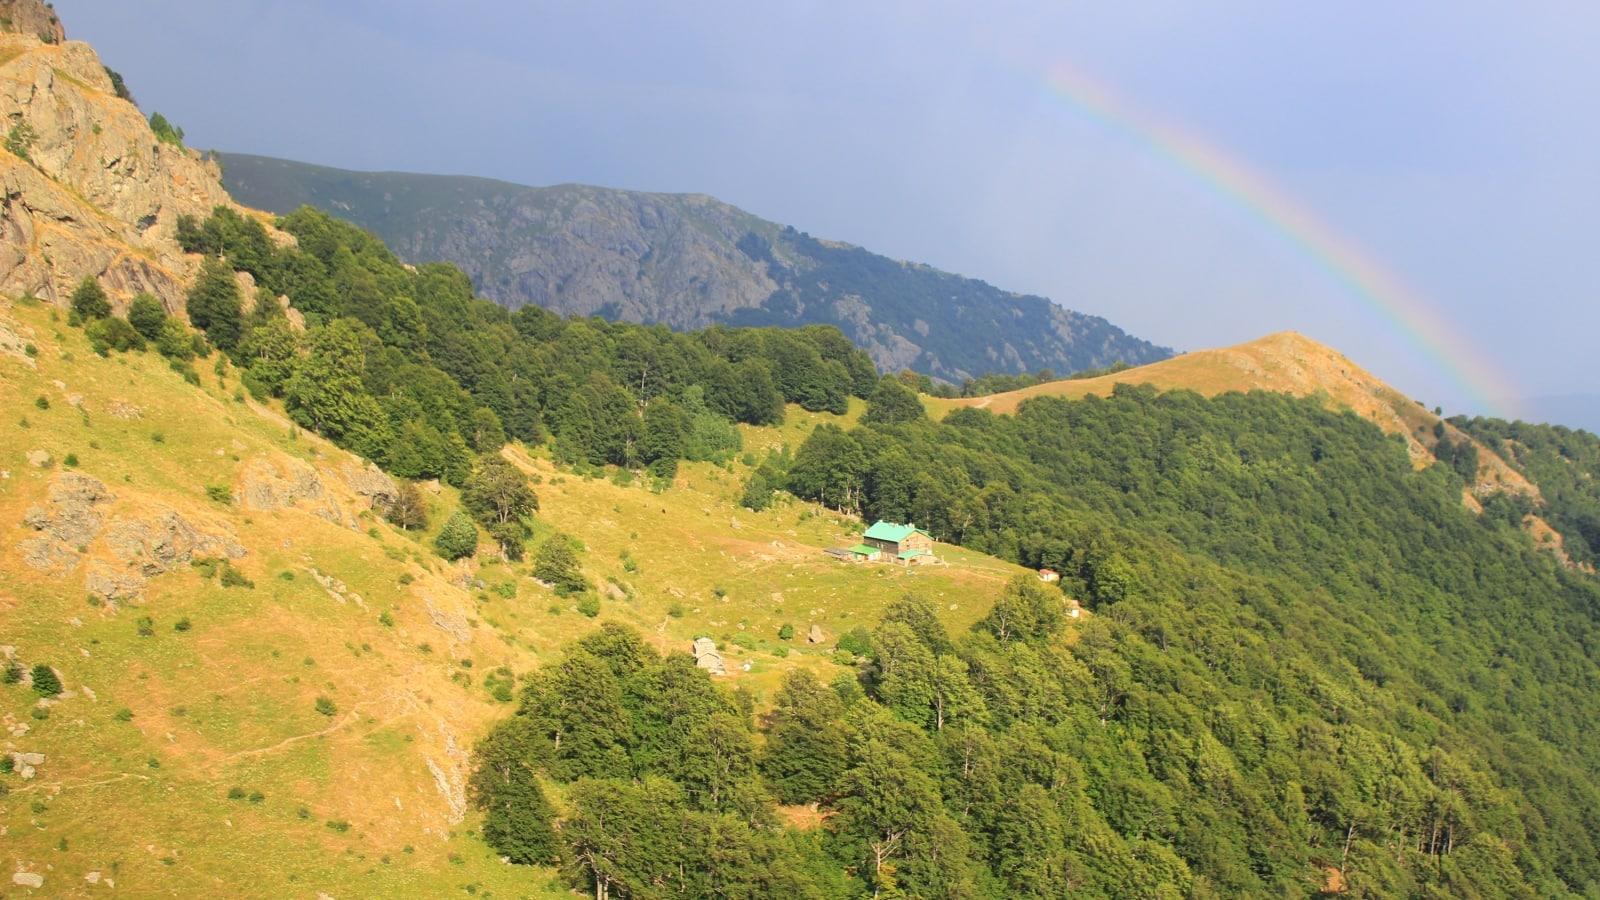 Dzhendema protected area - photo: Central Balkan National Park